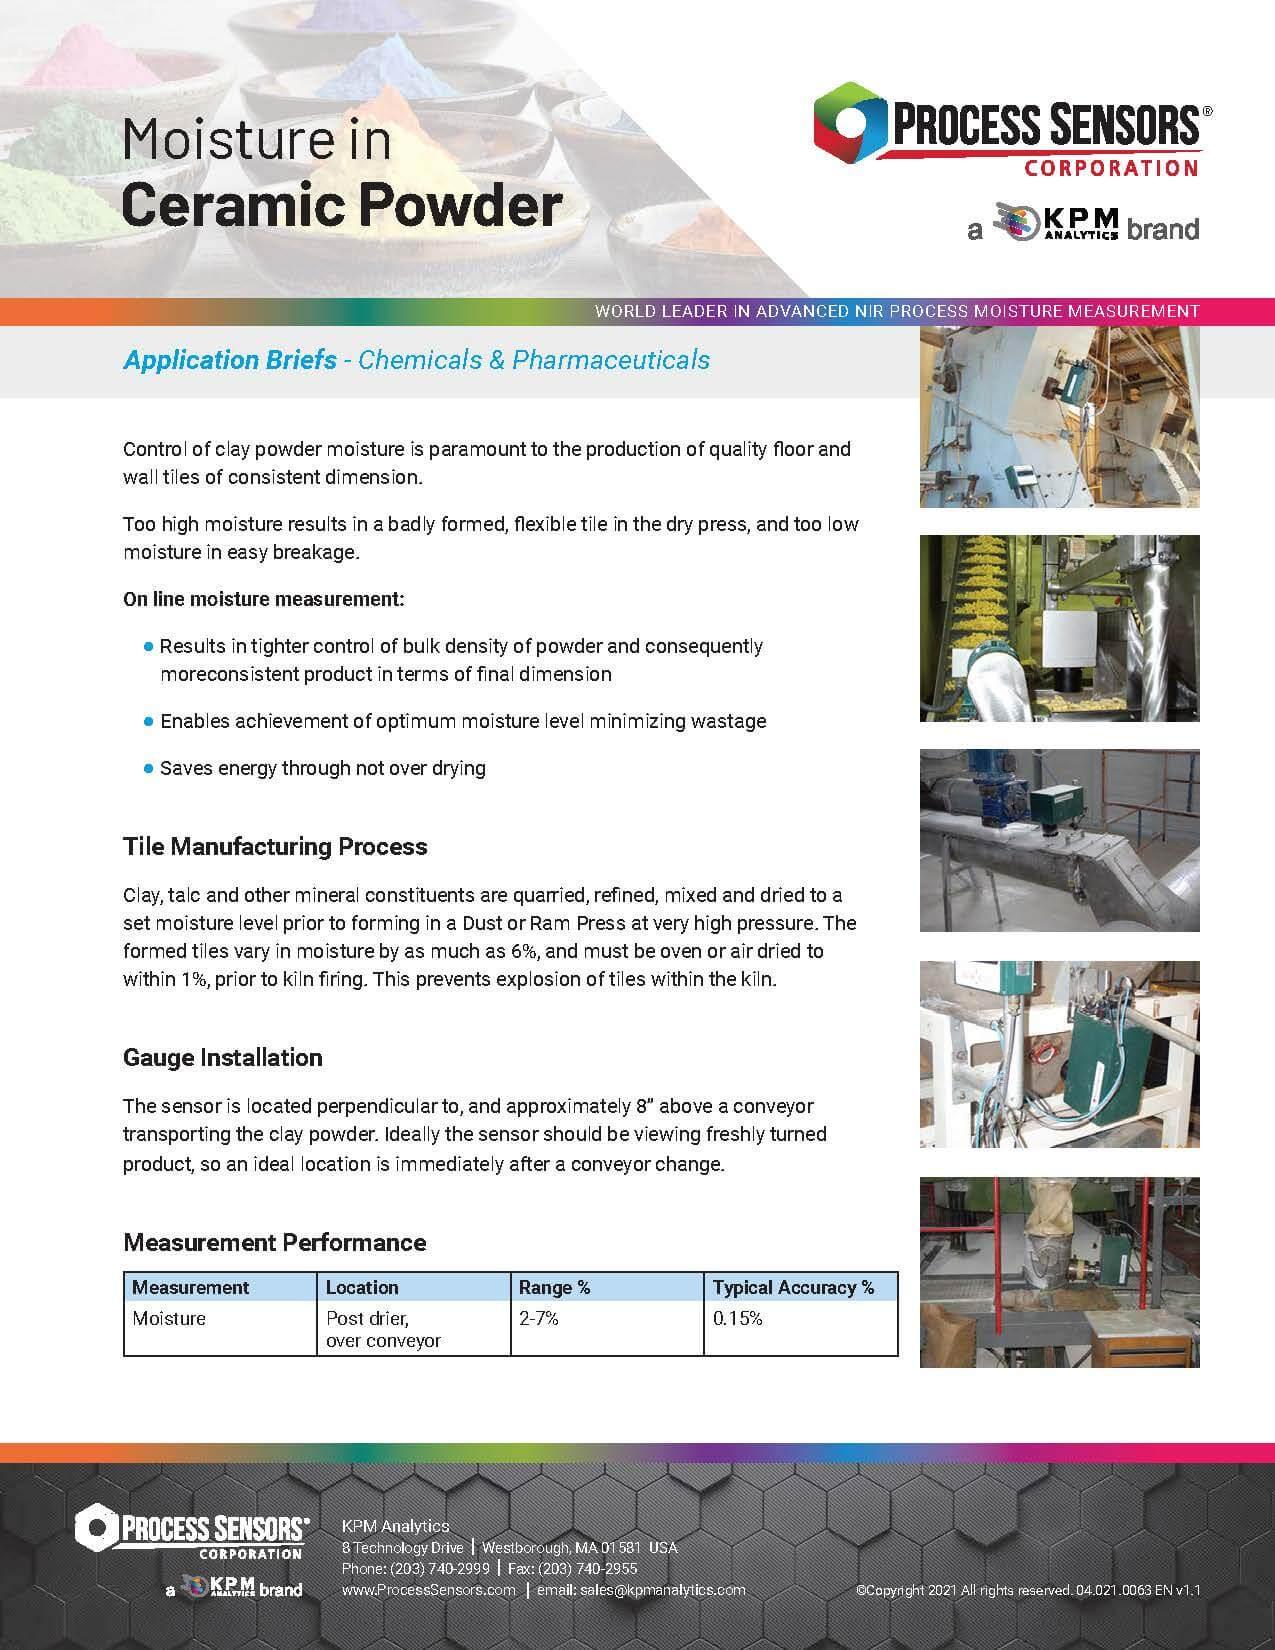 Moisture in Ceramic Powder